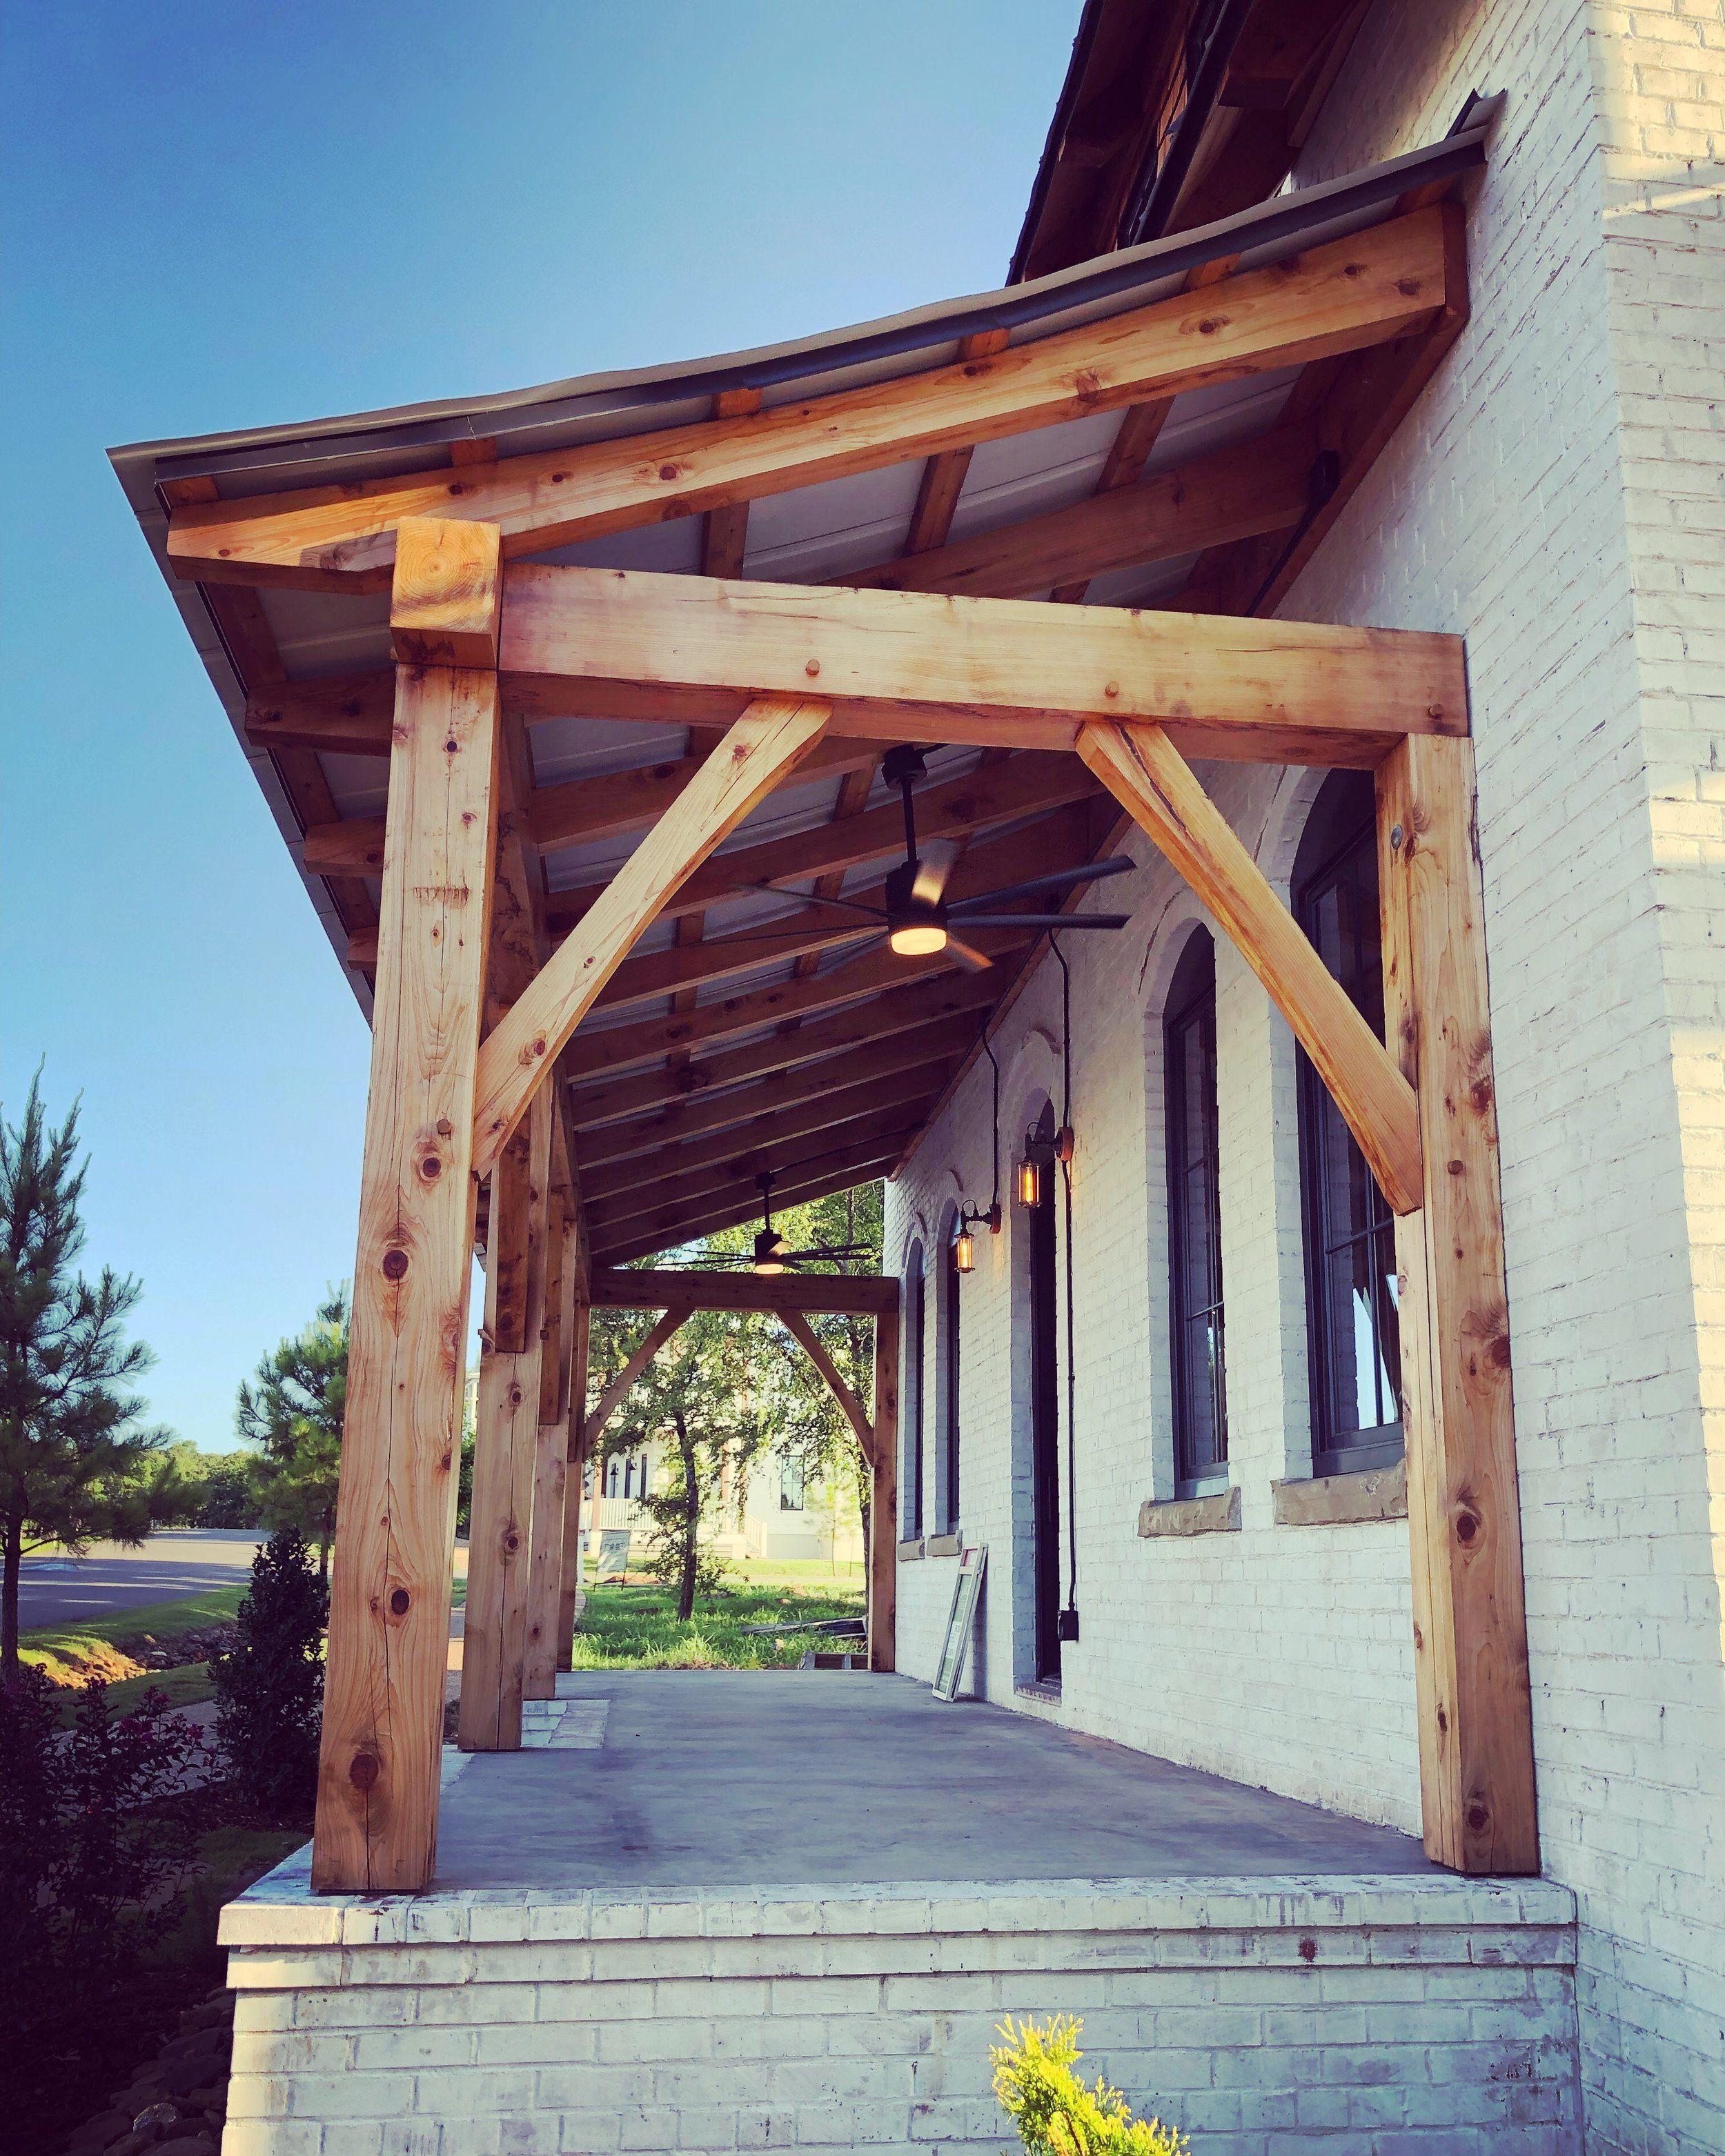 Timber Framed Porch Timber Frame Porch Porch Design House Front Porch